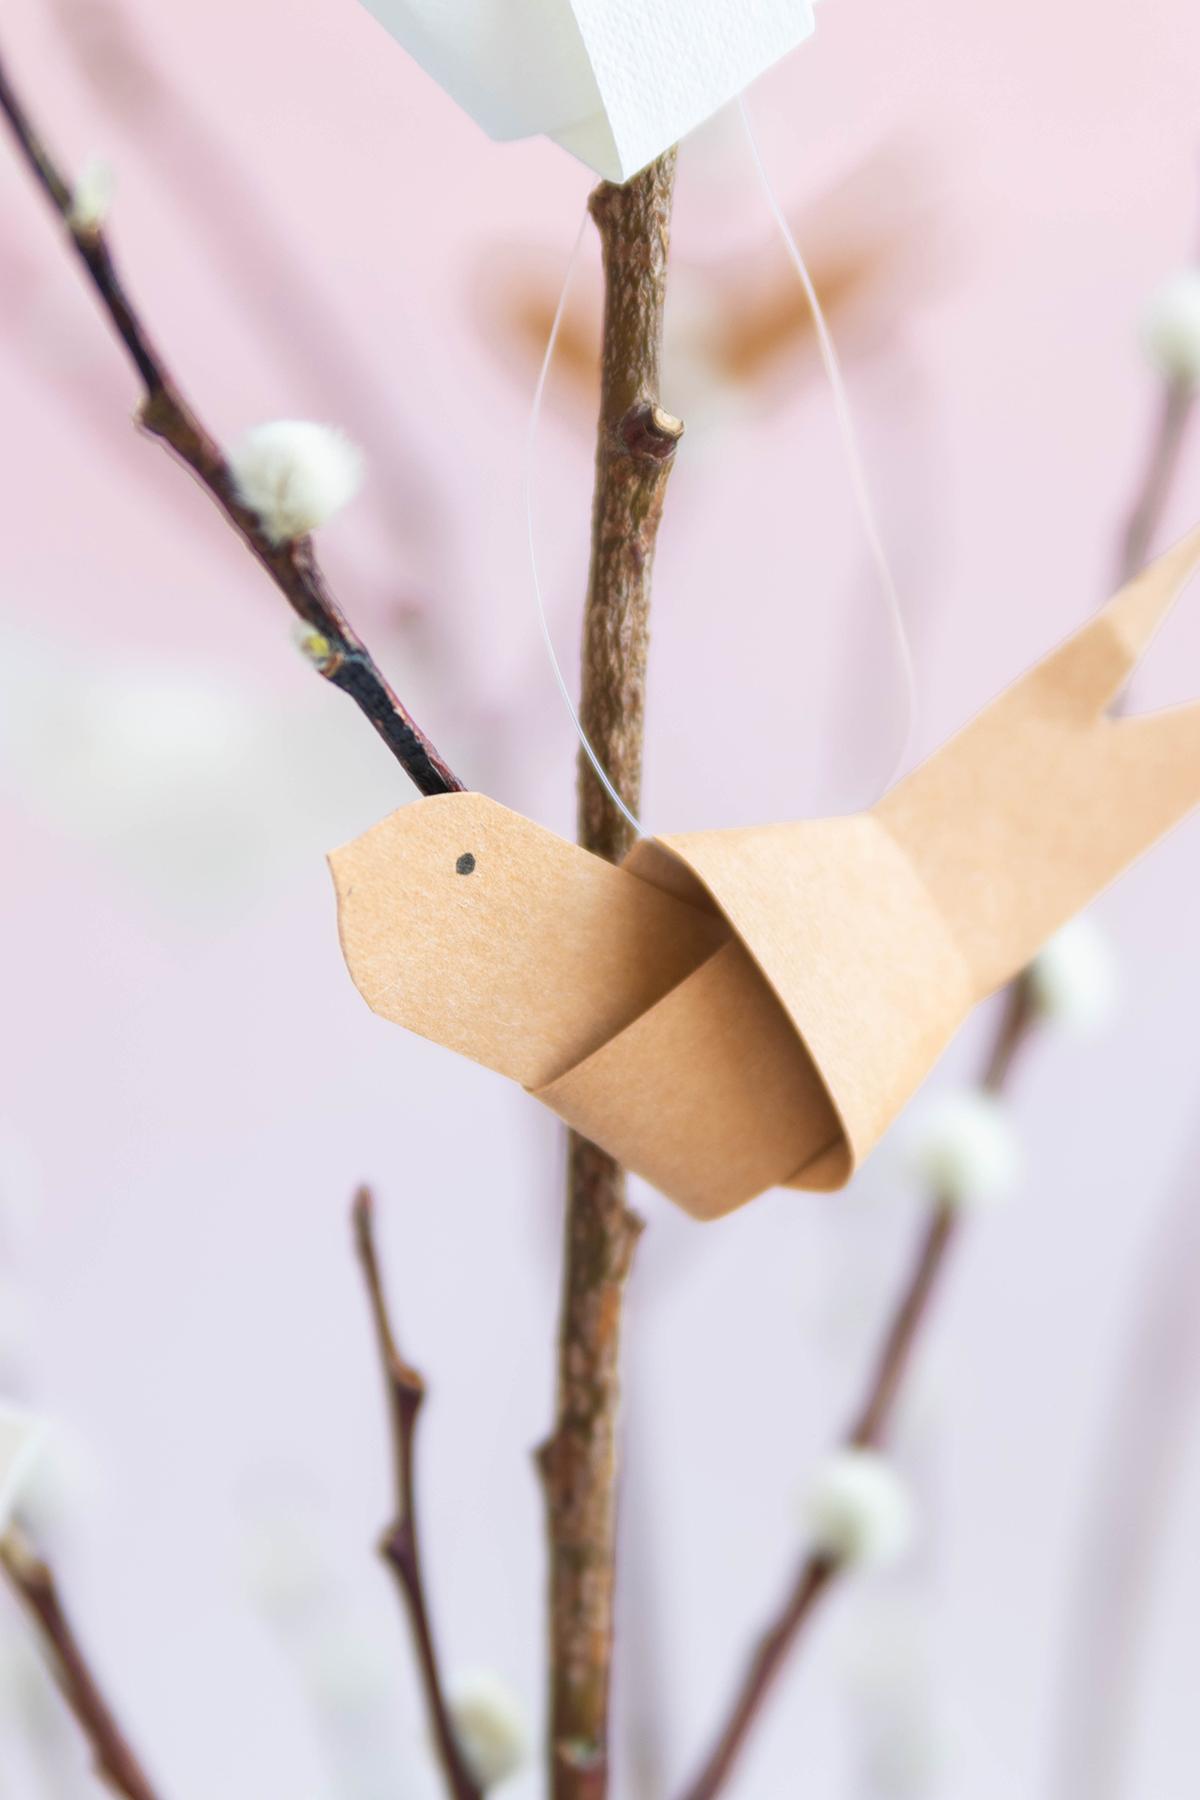 Papiervögel als Osterdeko basteln